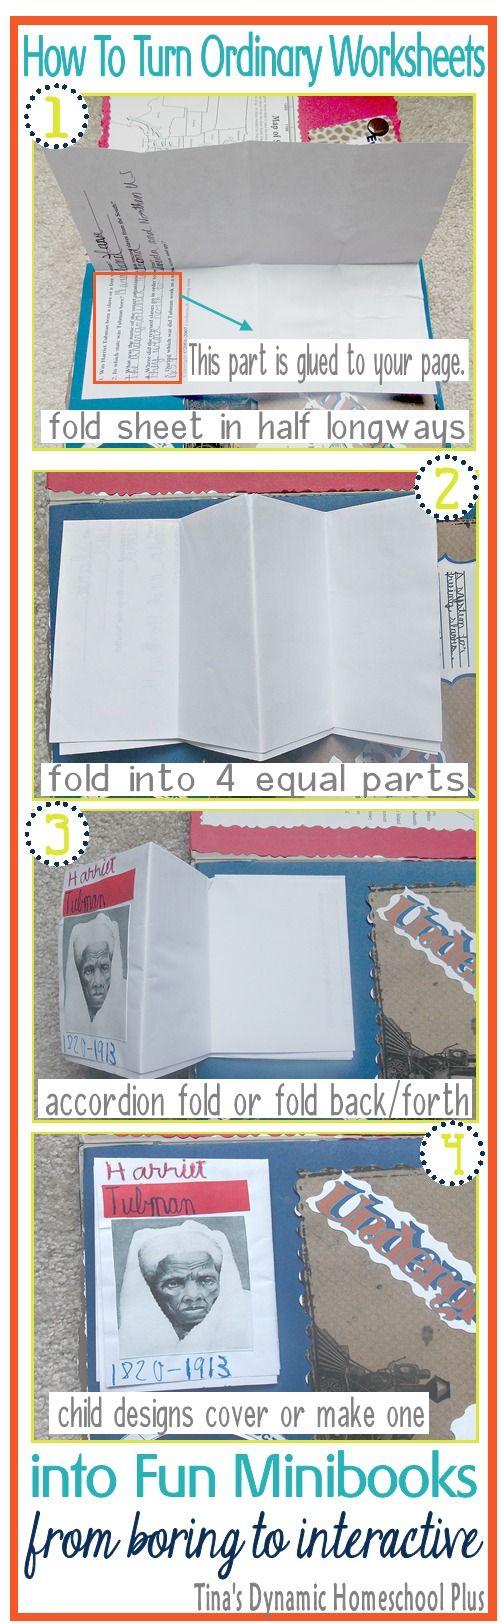 The 99 best lapbooks images on Pinterest | Lap books, Teaching ...